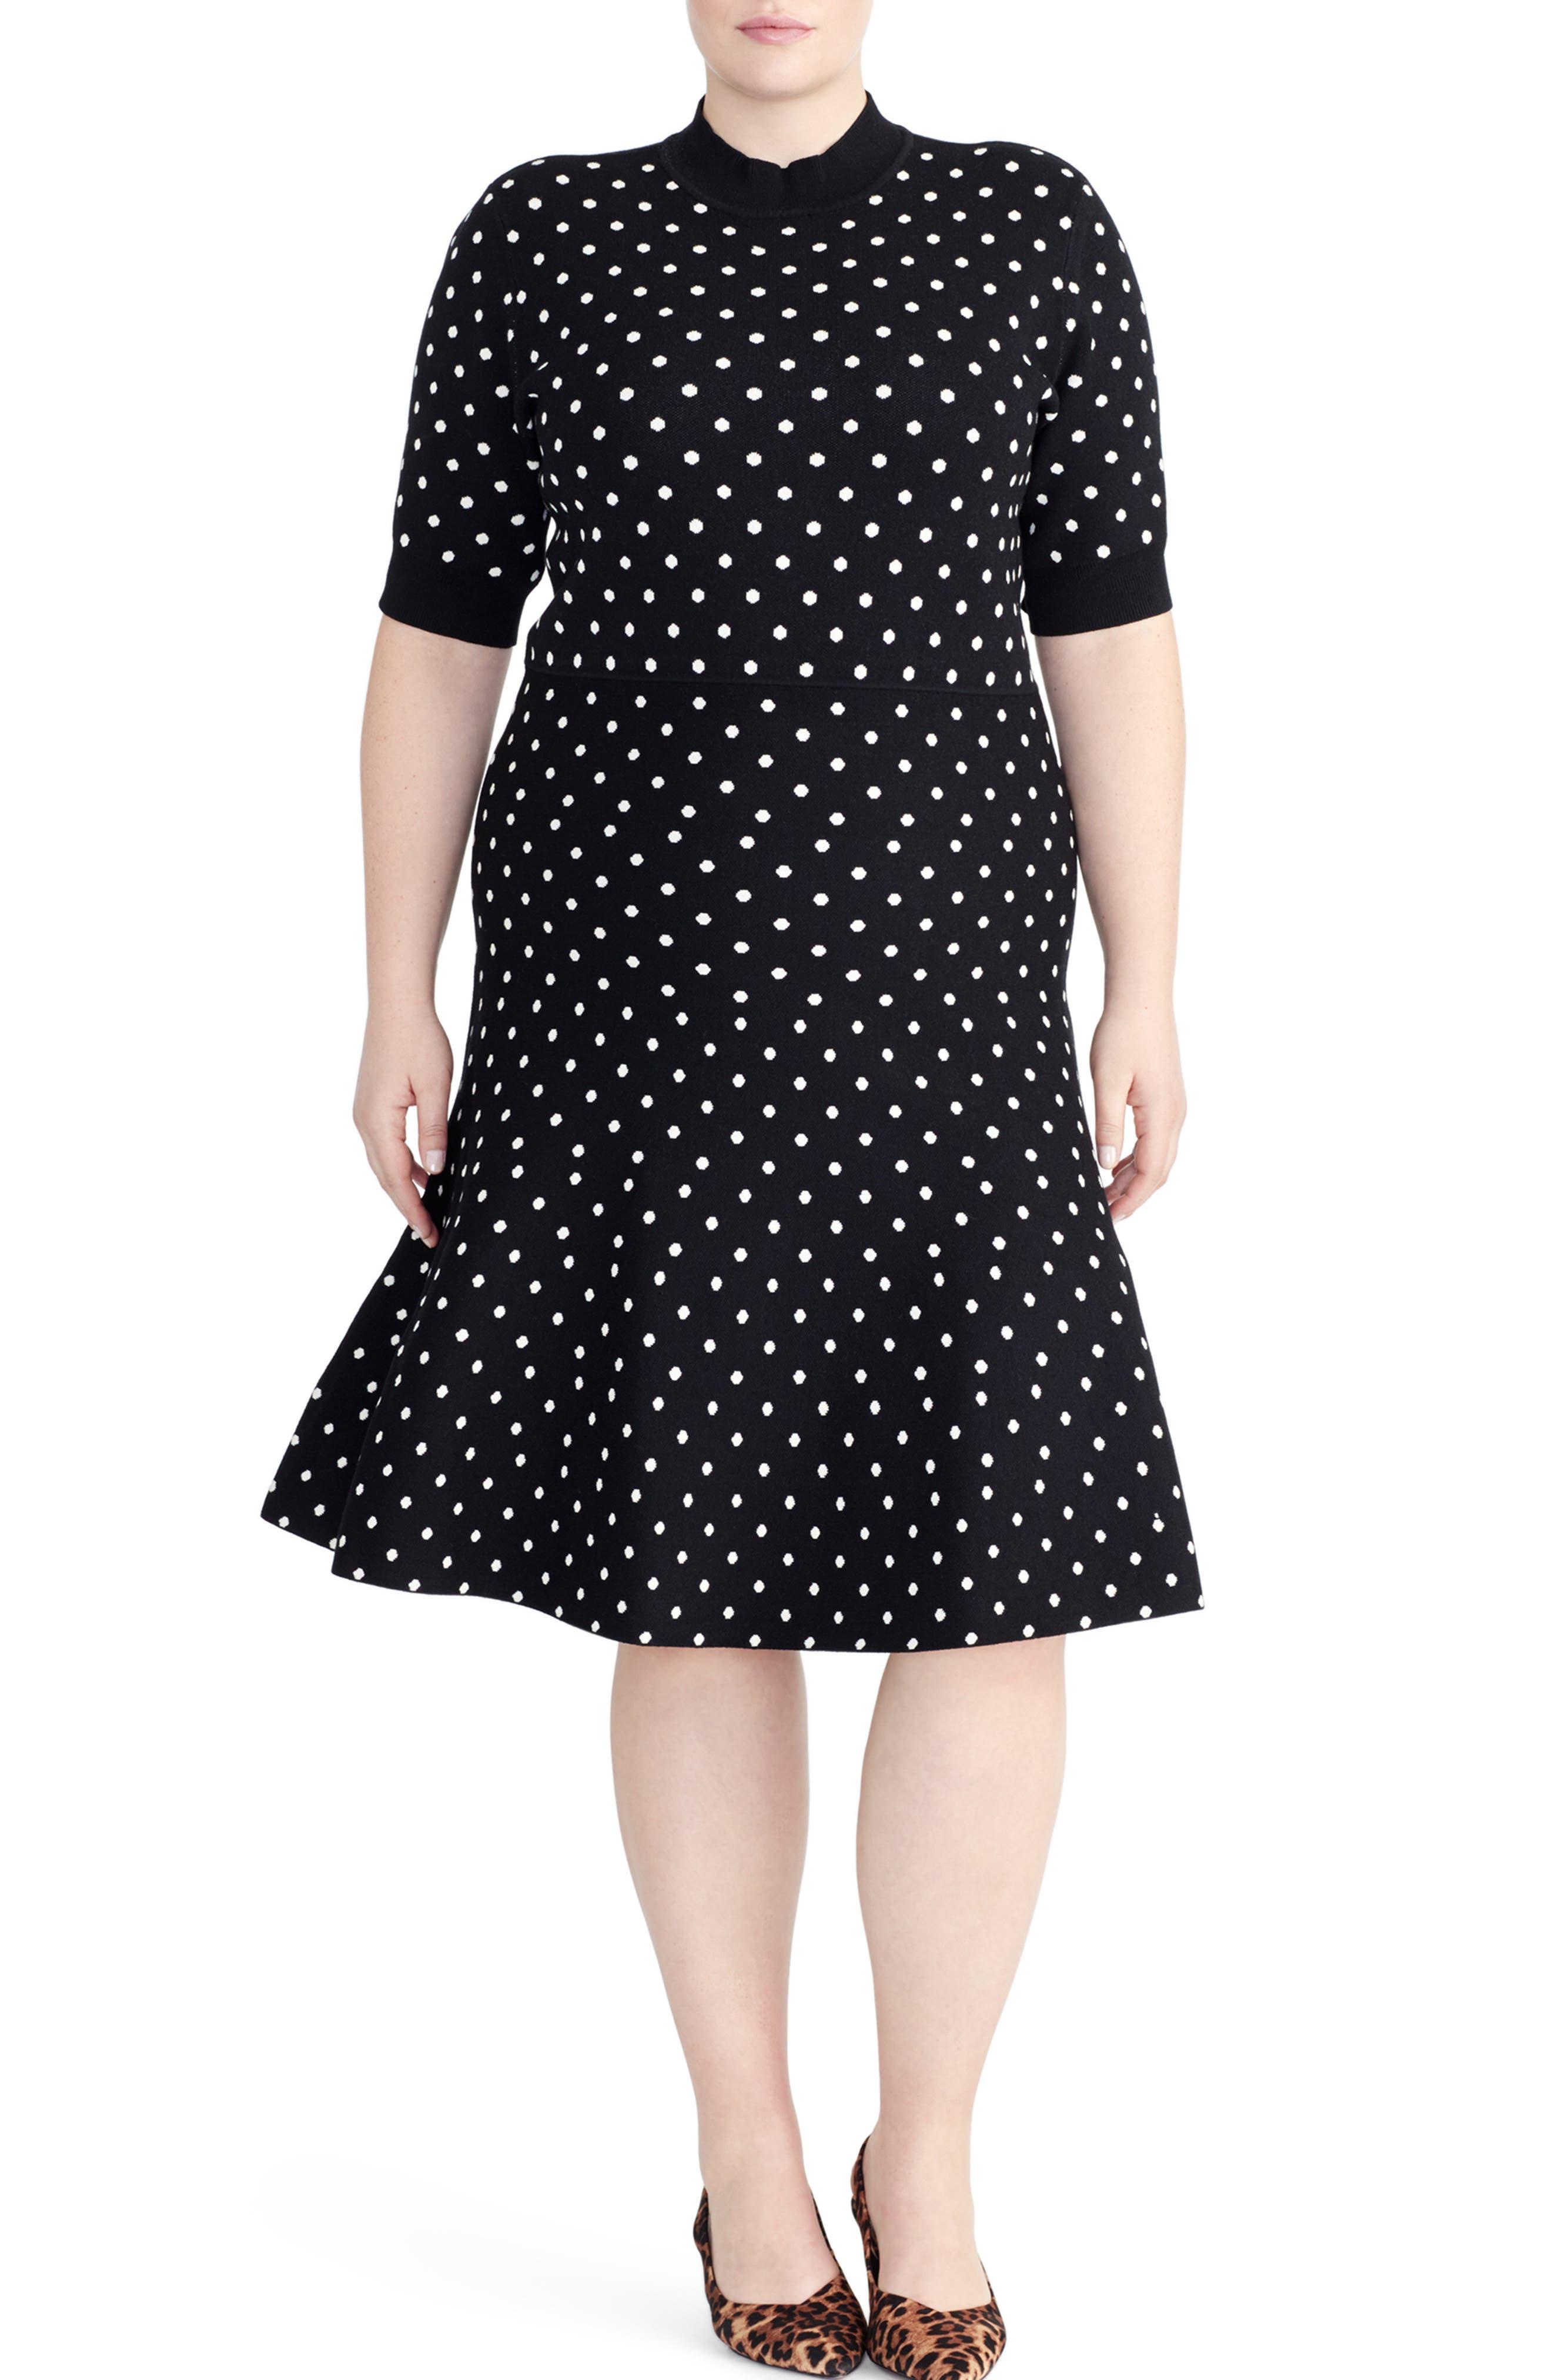 RACHEL ROY COLLECTION,                             Polka Dot Fit & Flare Dress,                             Main thumbnail 1, color,                             BLACK/ LIGHT BIEGE